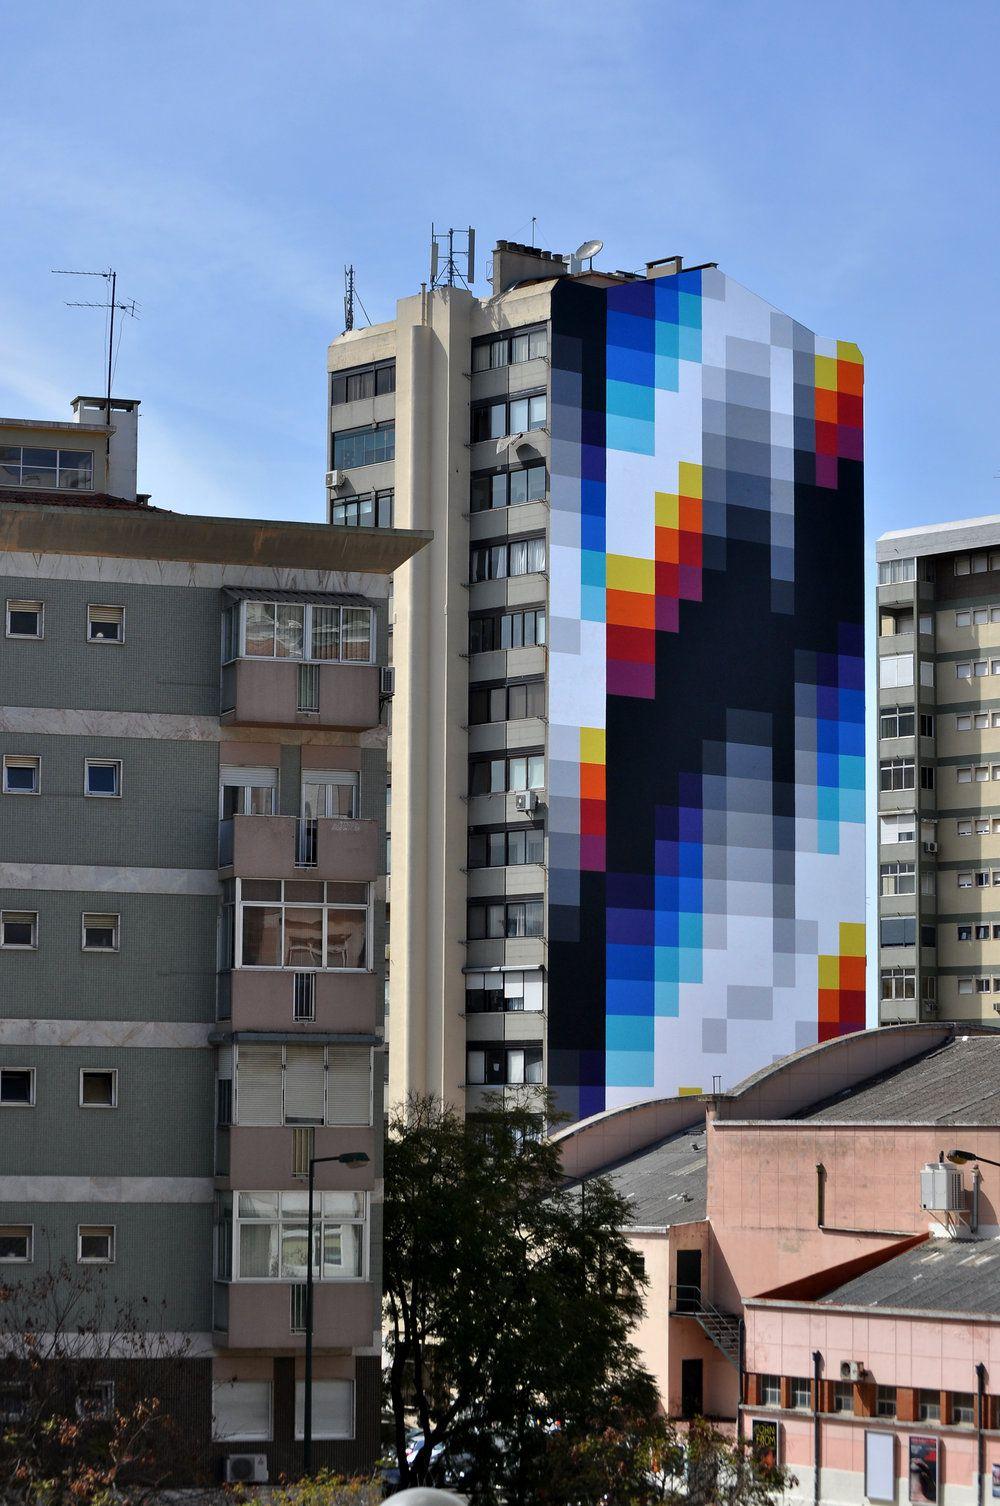 Chromatic 80s Style Murals By Felipe Pantone 8